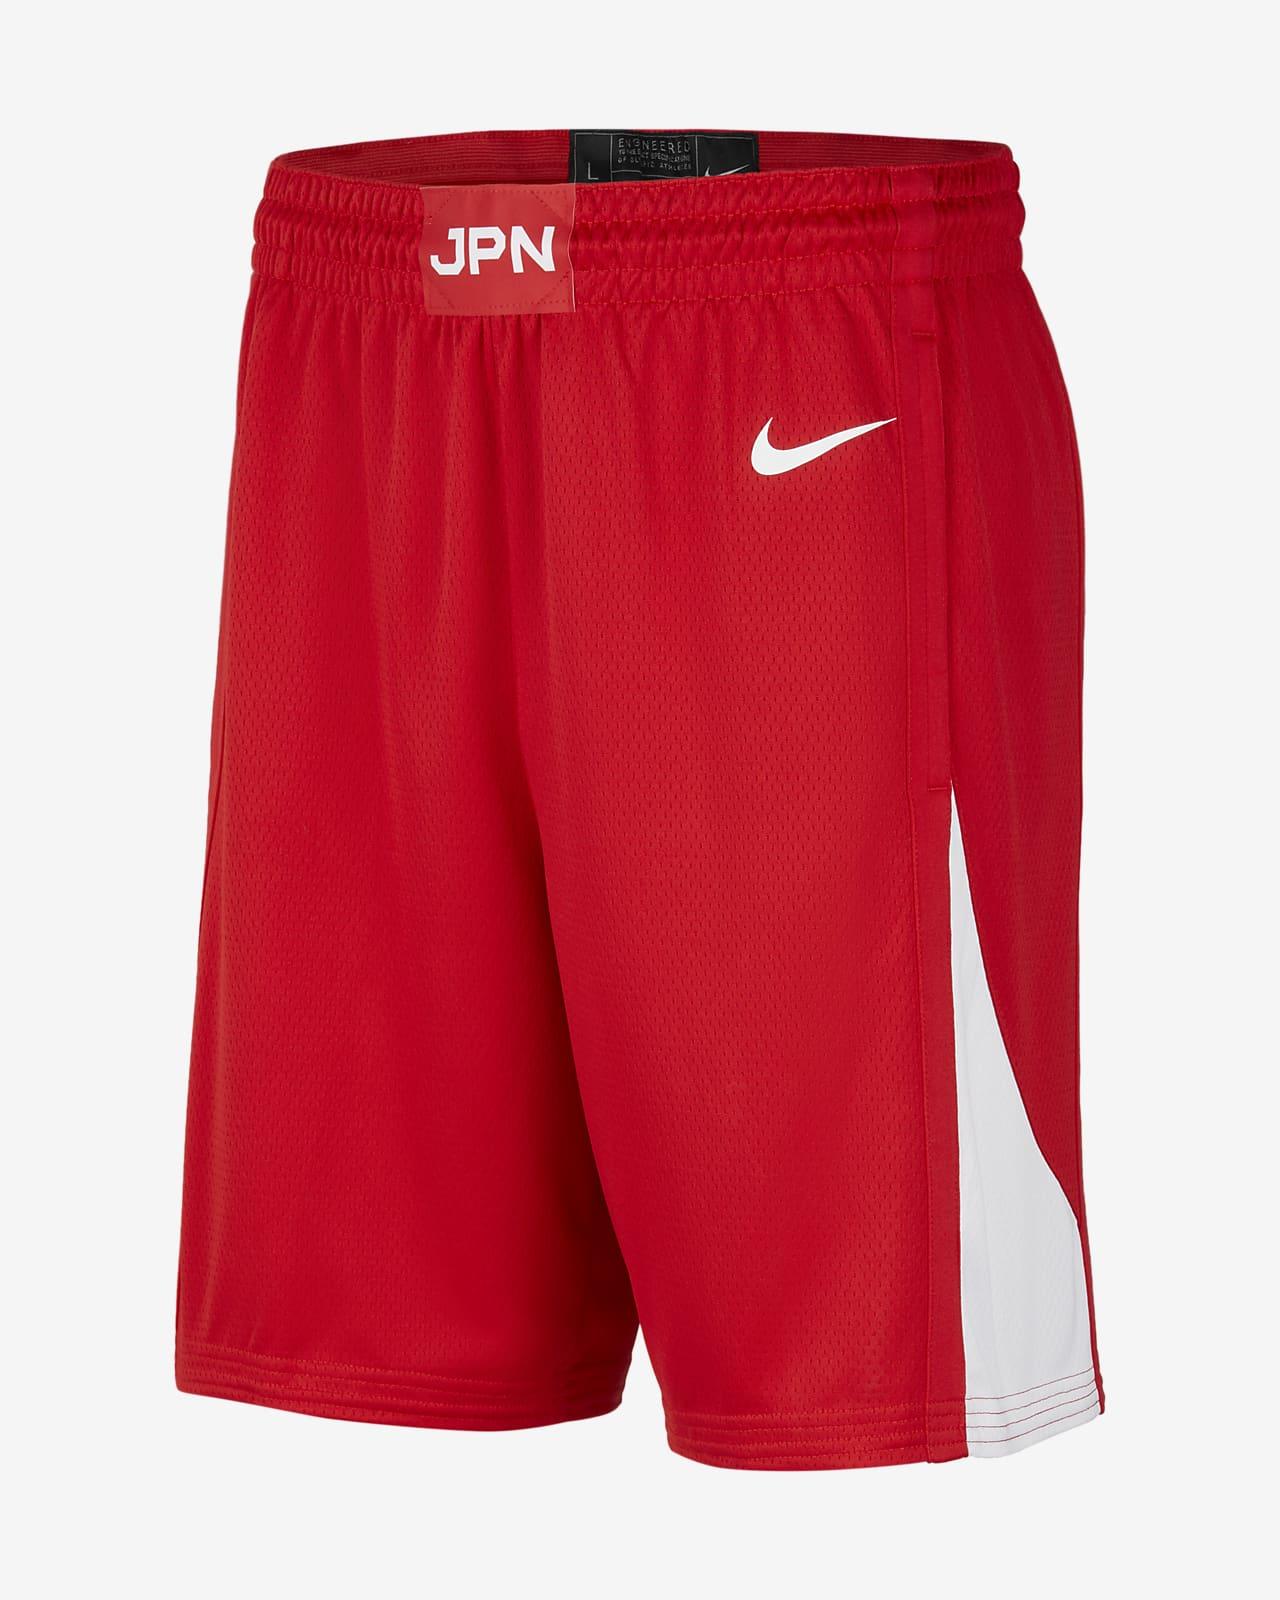 Japan (Road) Nike Limited Men's Basketball Shorts